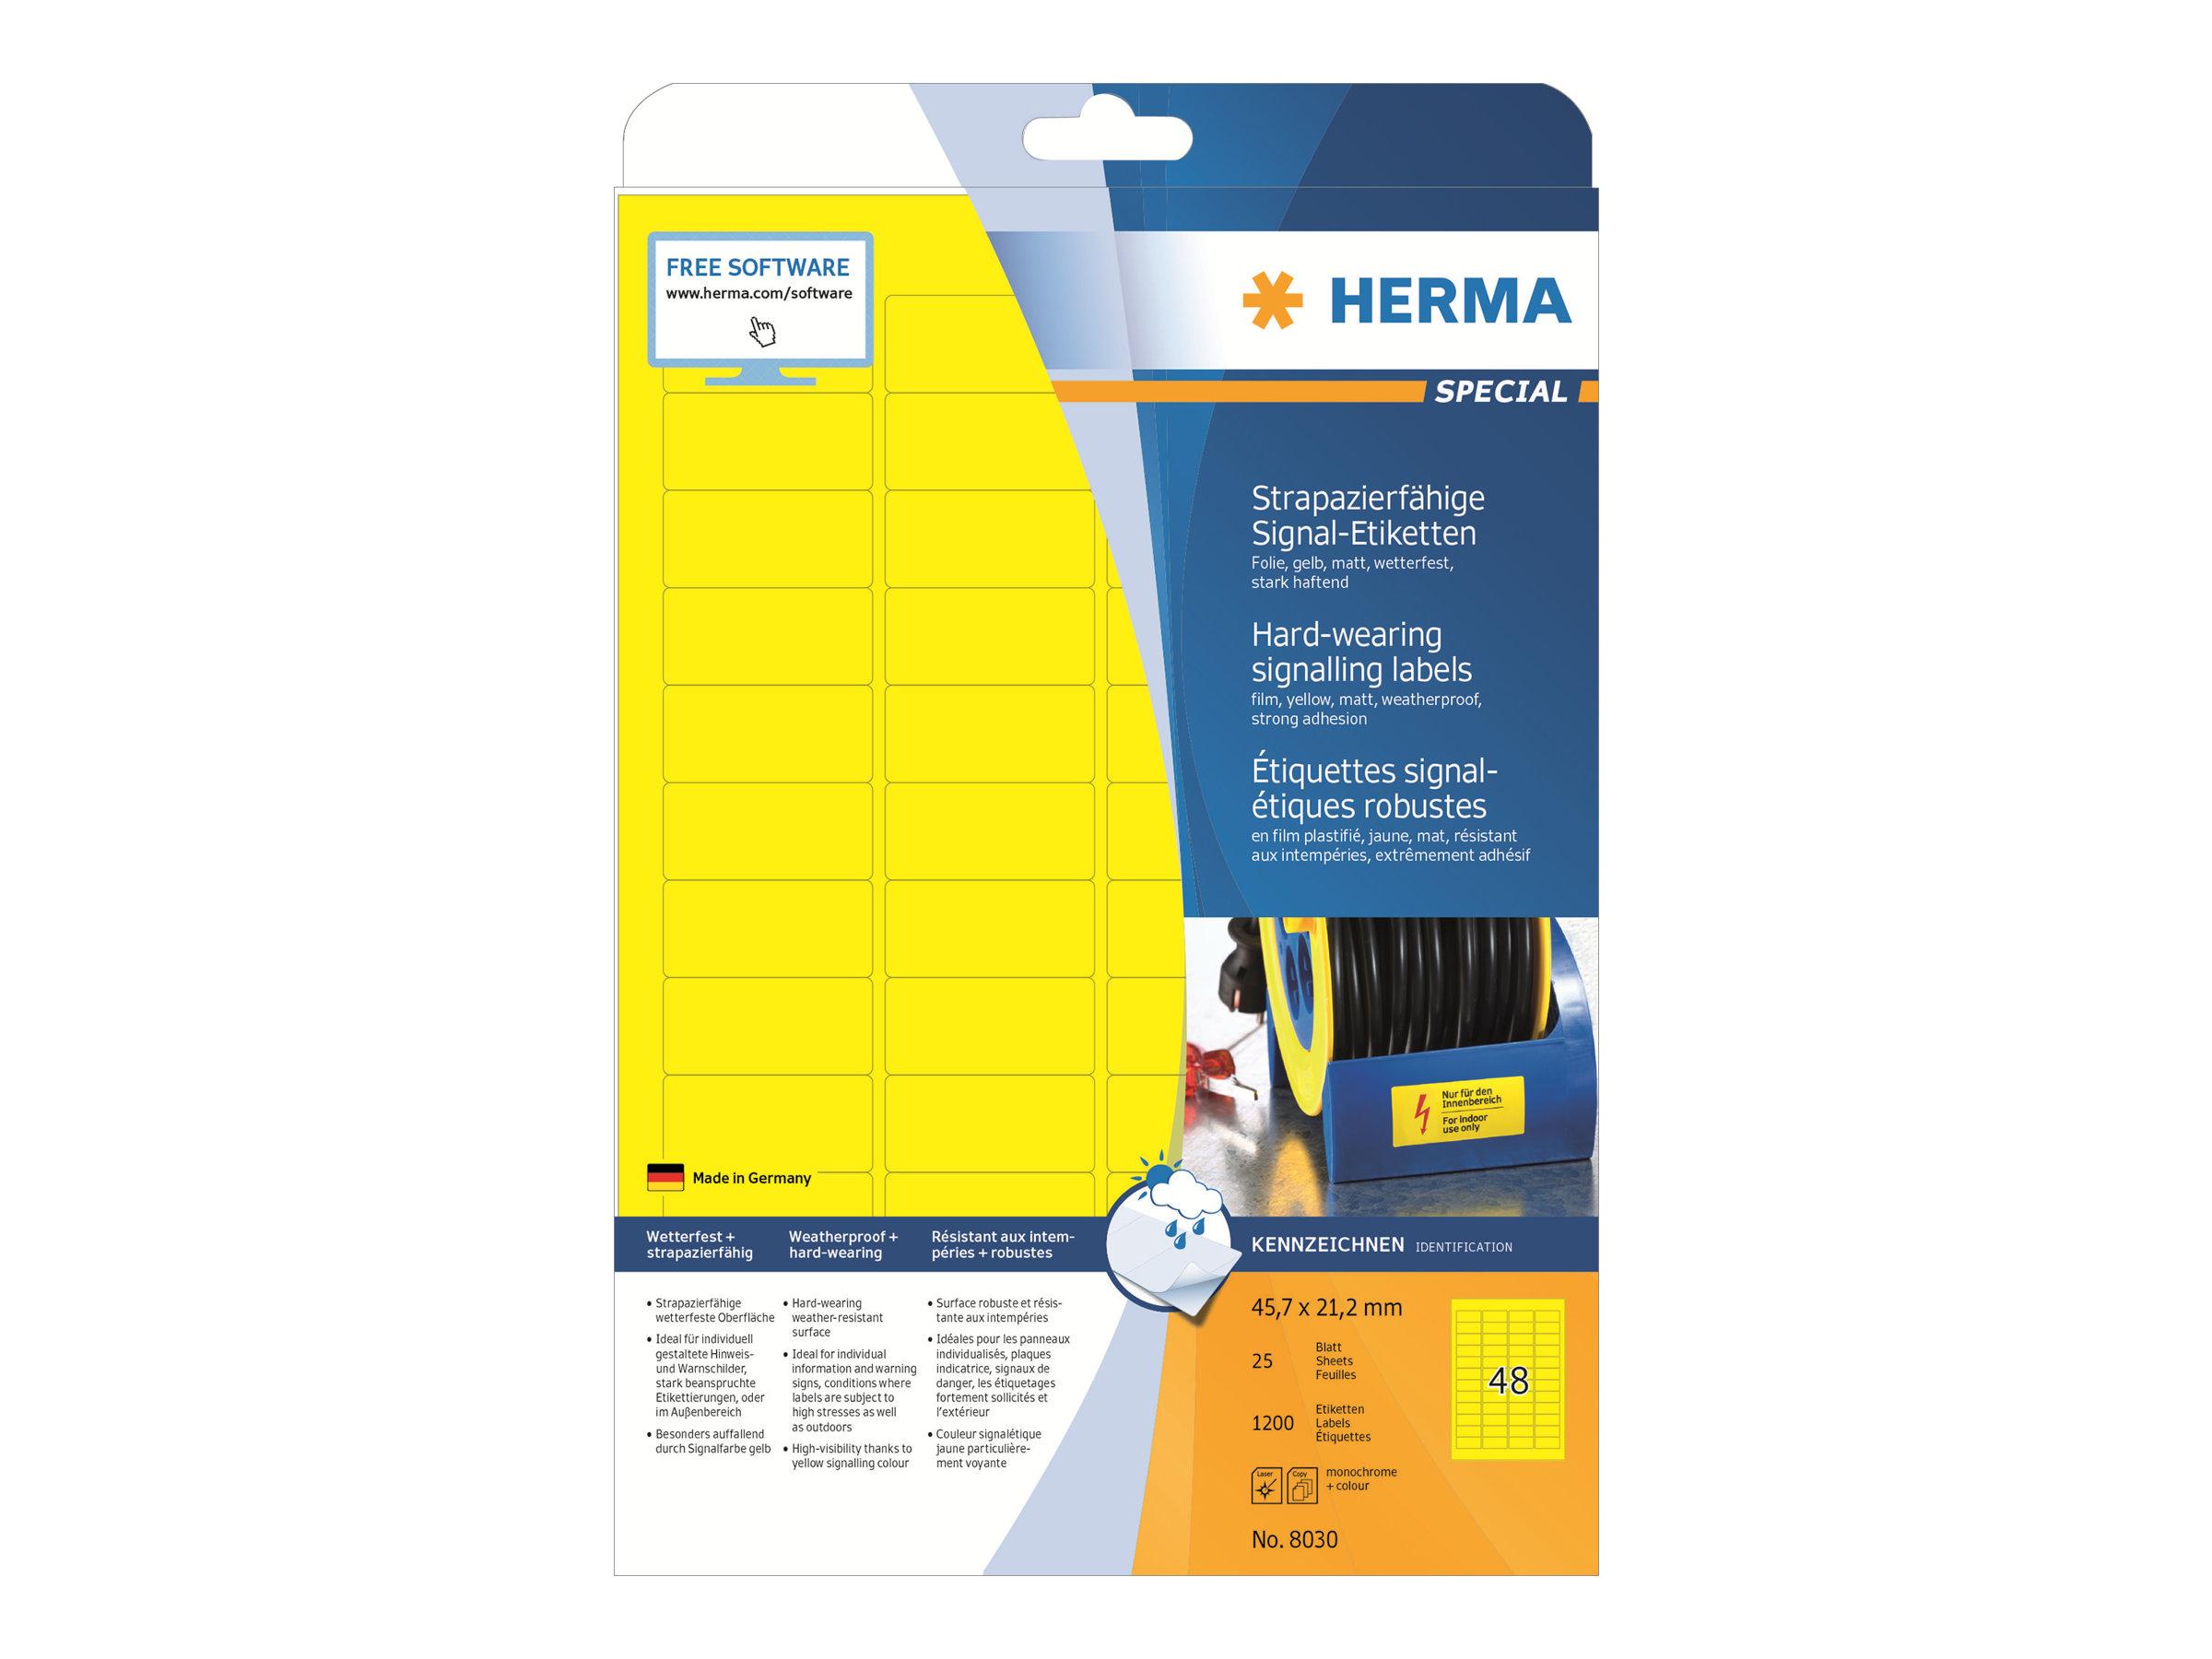 HERMA Special - Matt - selbstklebend - Gelb - 21.2 x 45.7 mm 1200 Stck. (25 Bogen x 48)